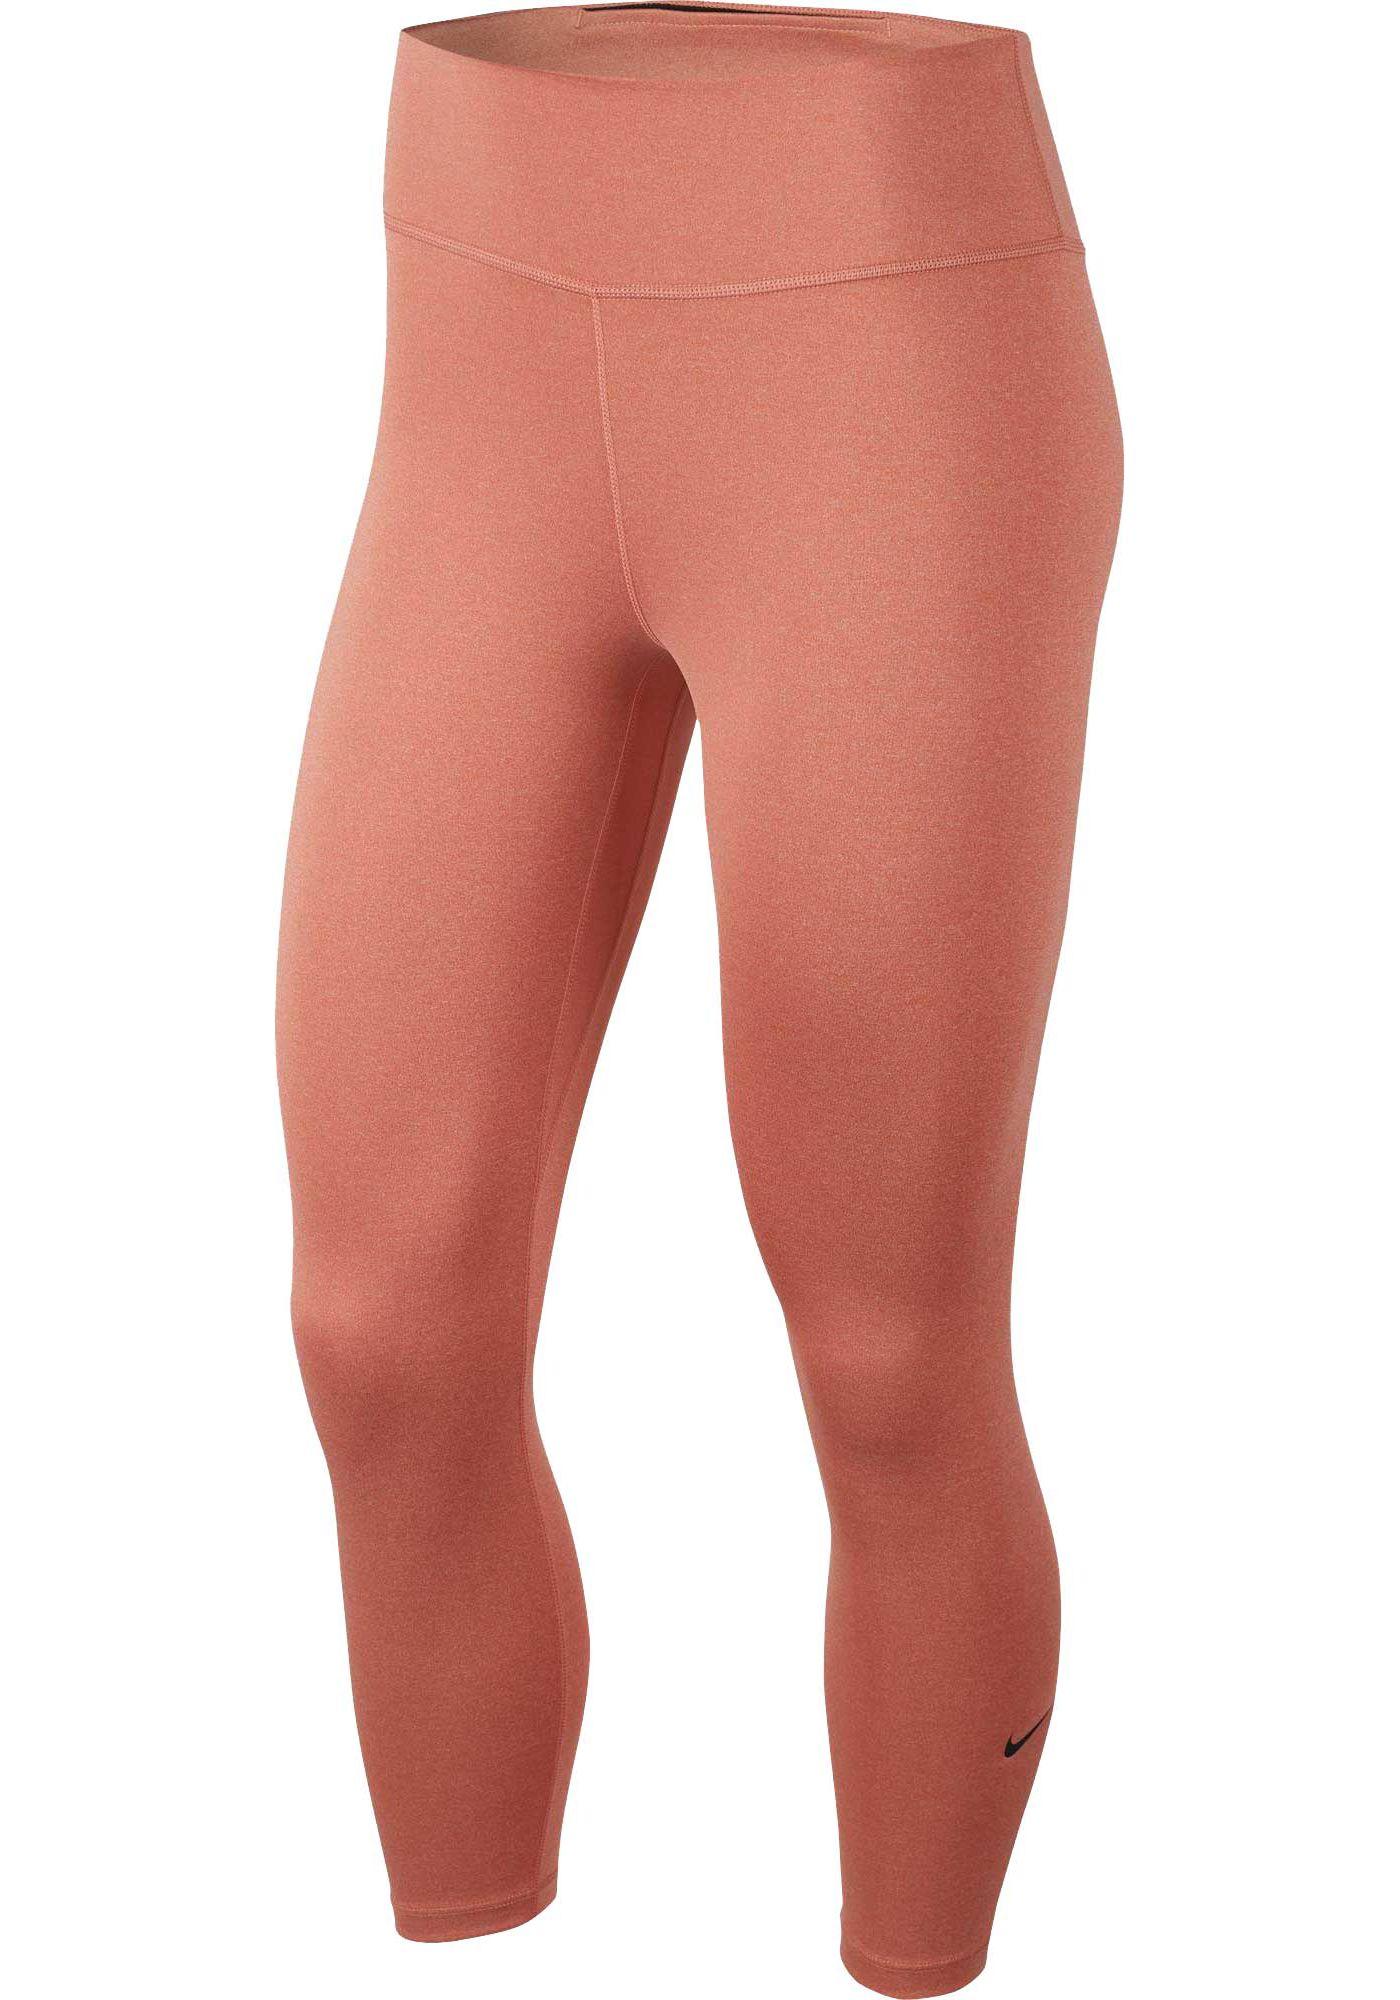 Women's Nike One Cropped Leggings